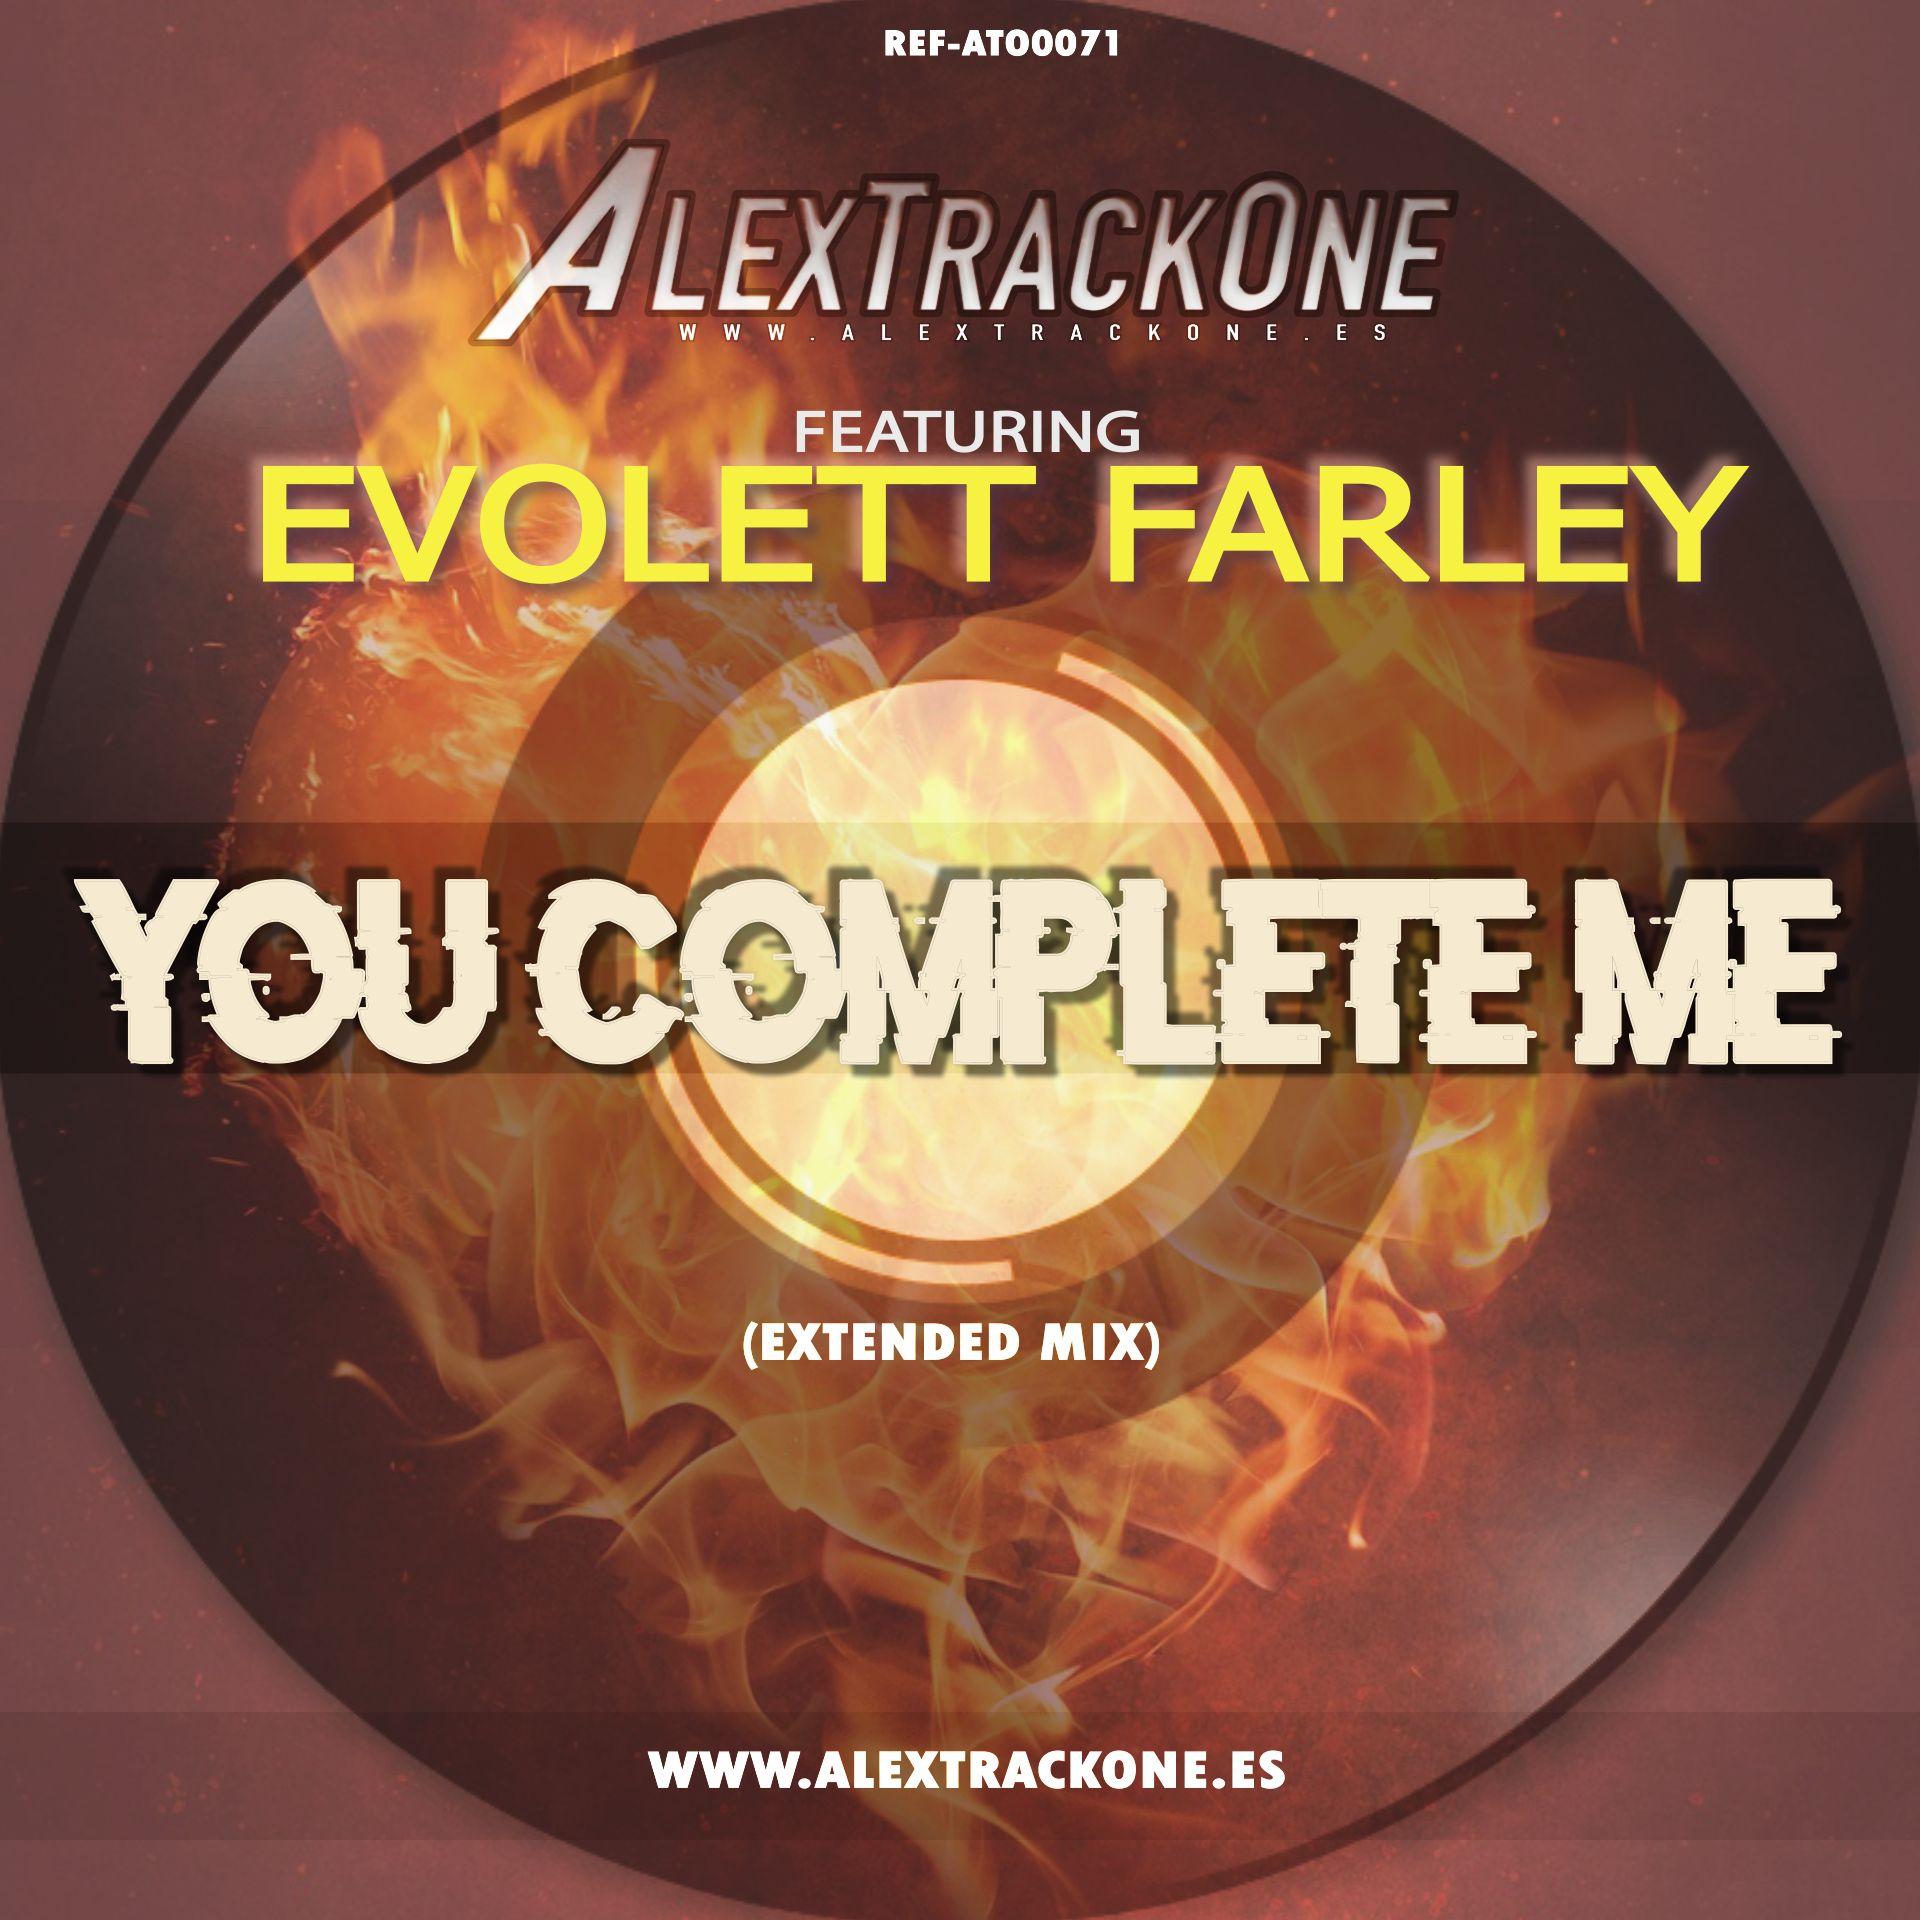 REF-ATO0071 FEAT EVOLETT FARLEY - YOU COMPLETE ME (ORIGINAL MIX) (MP3 & WAV & FLAC)